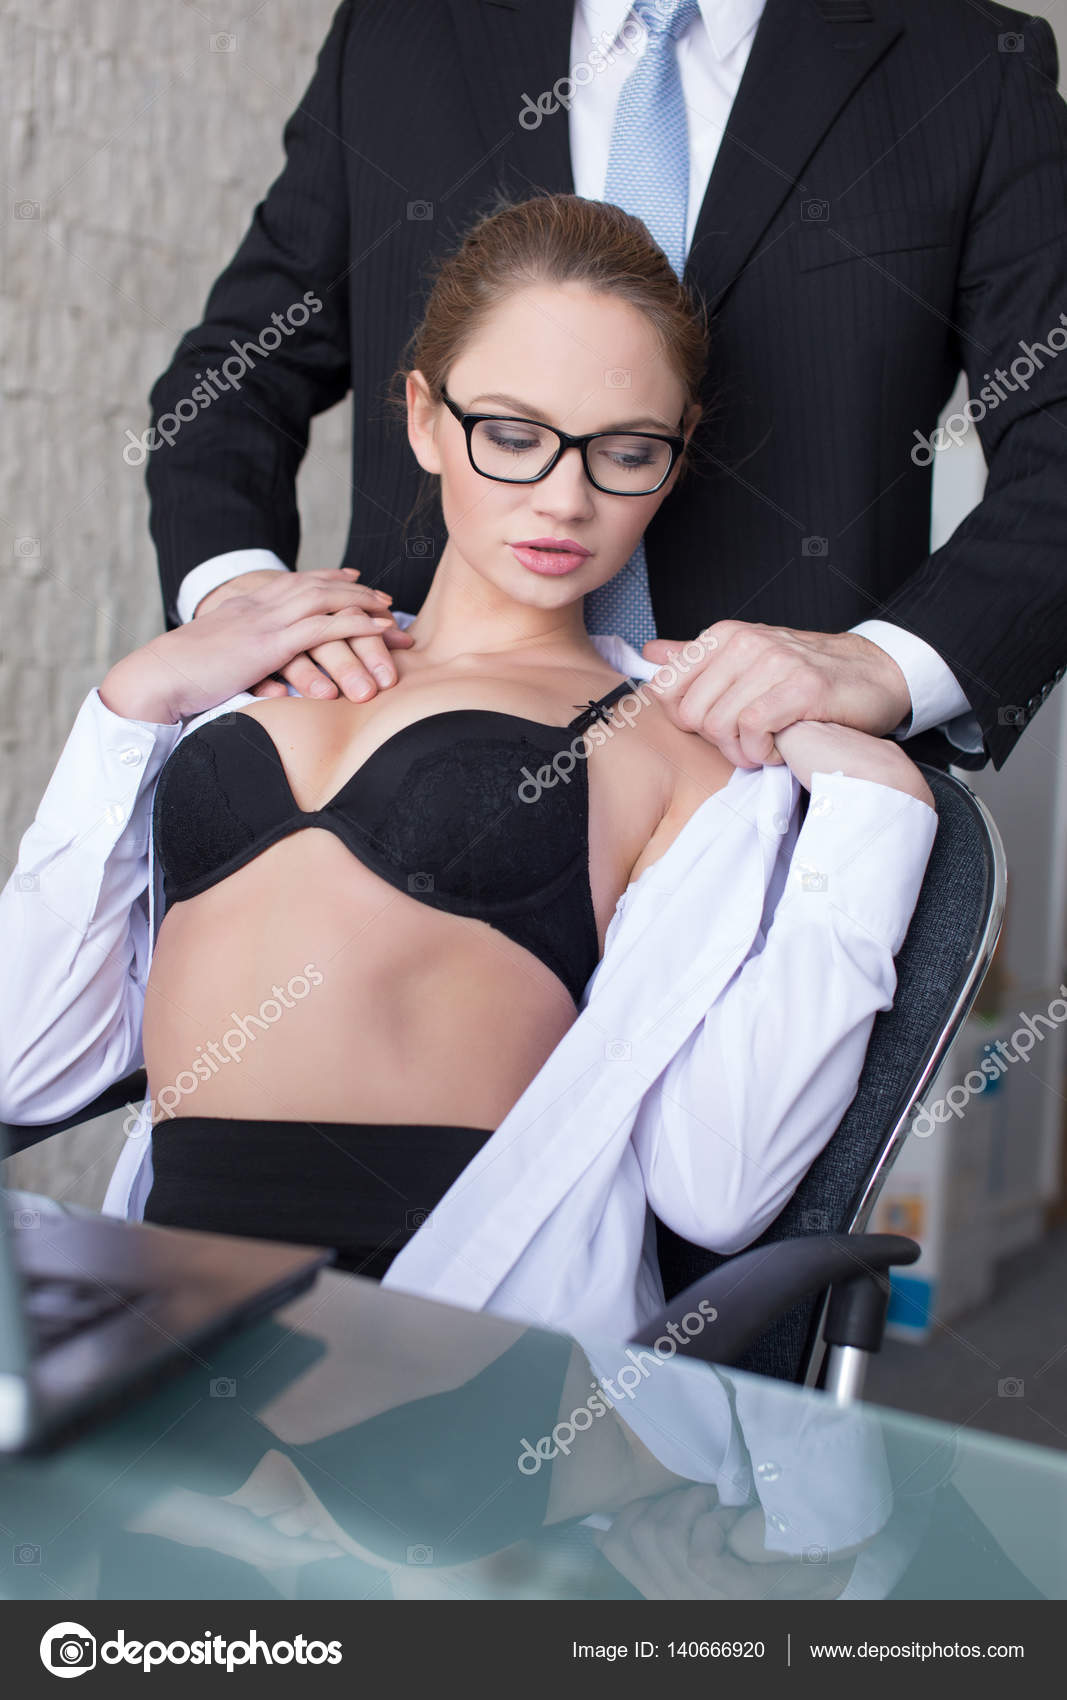 jefe secretaria rubia sexy desnudarse — fotos de stock